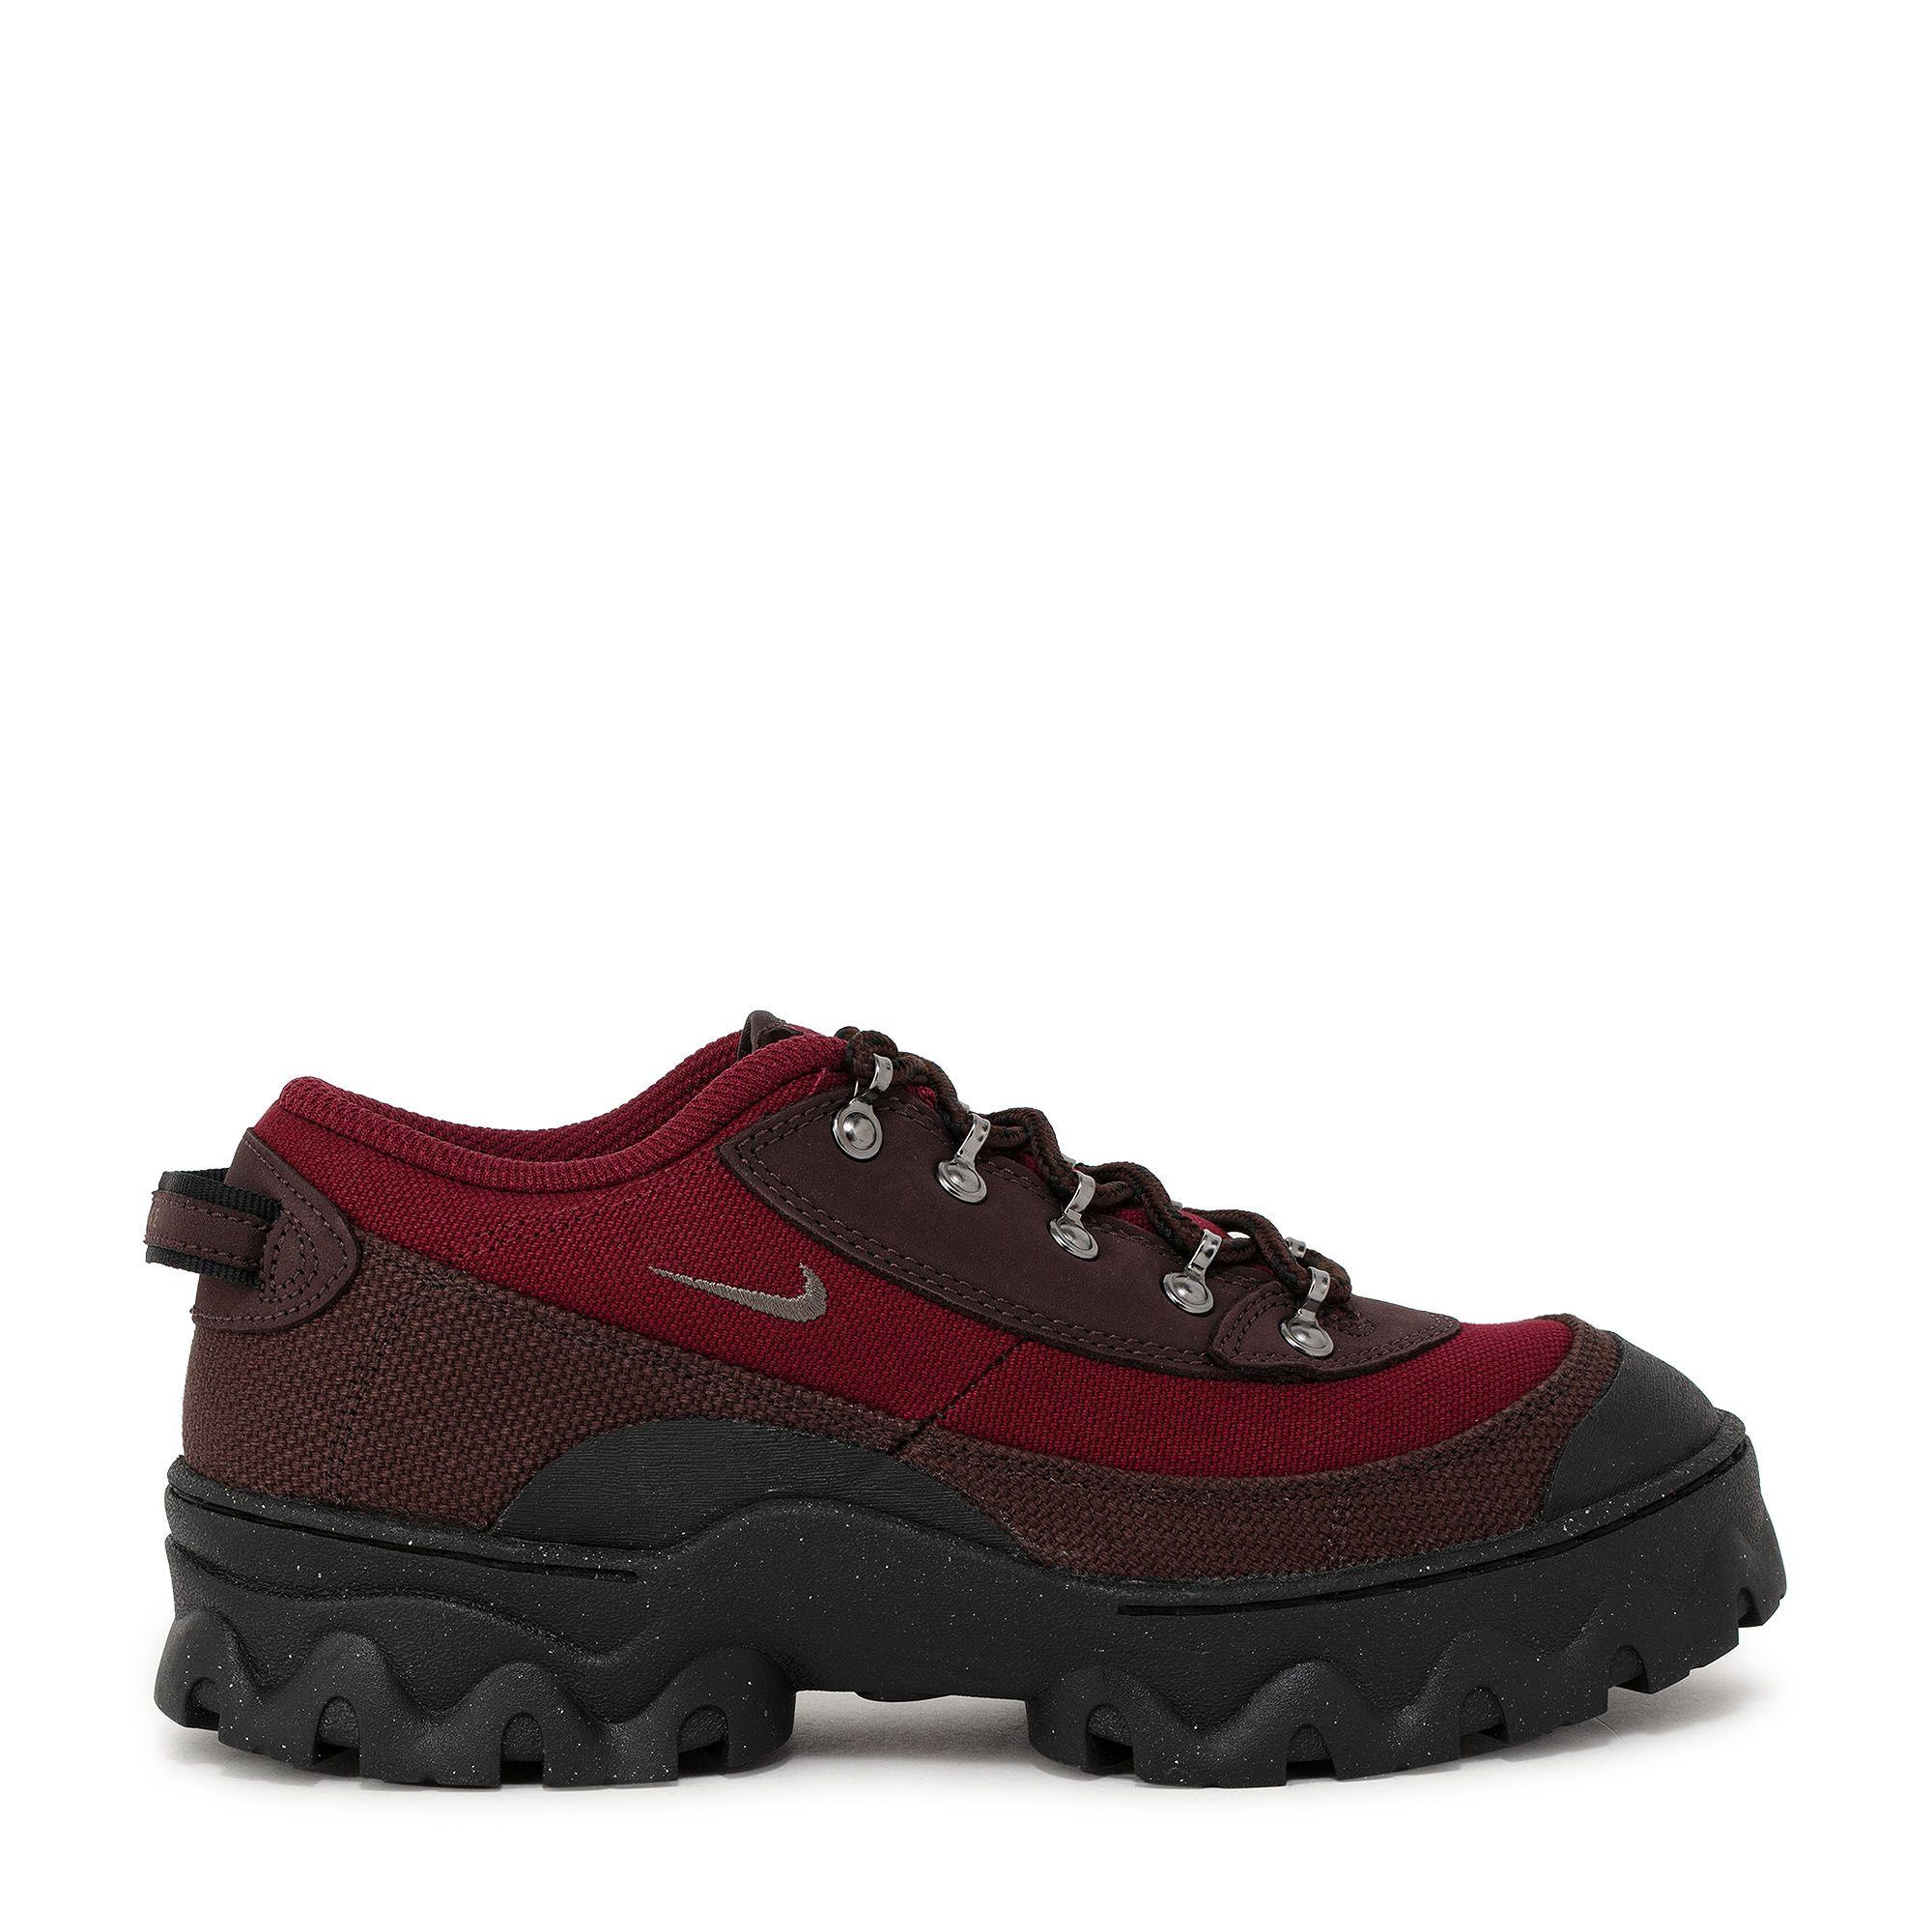 "Lahar Low ""Madeira"" sneakers"